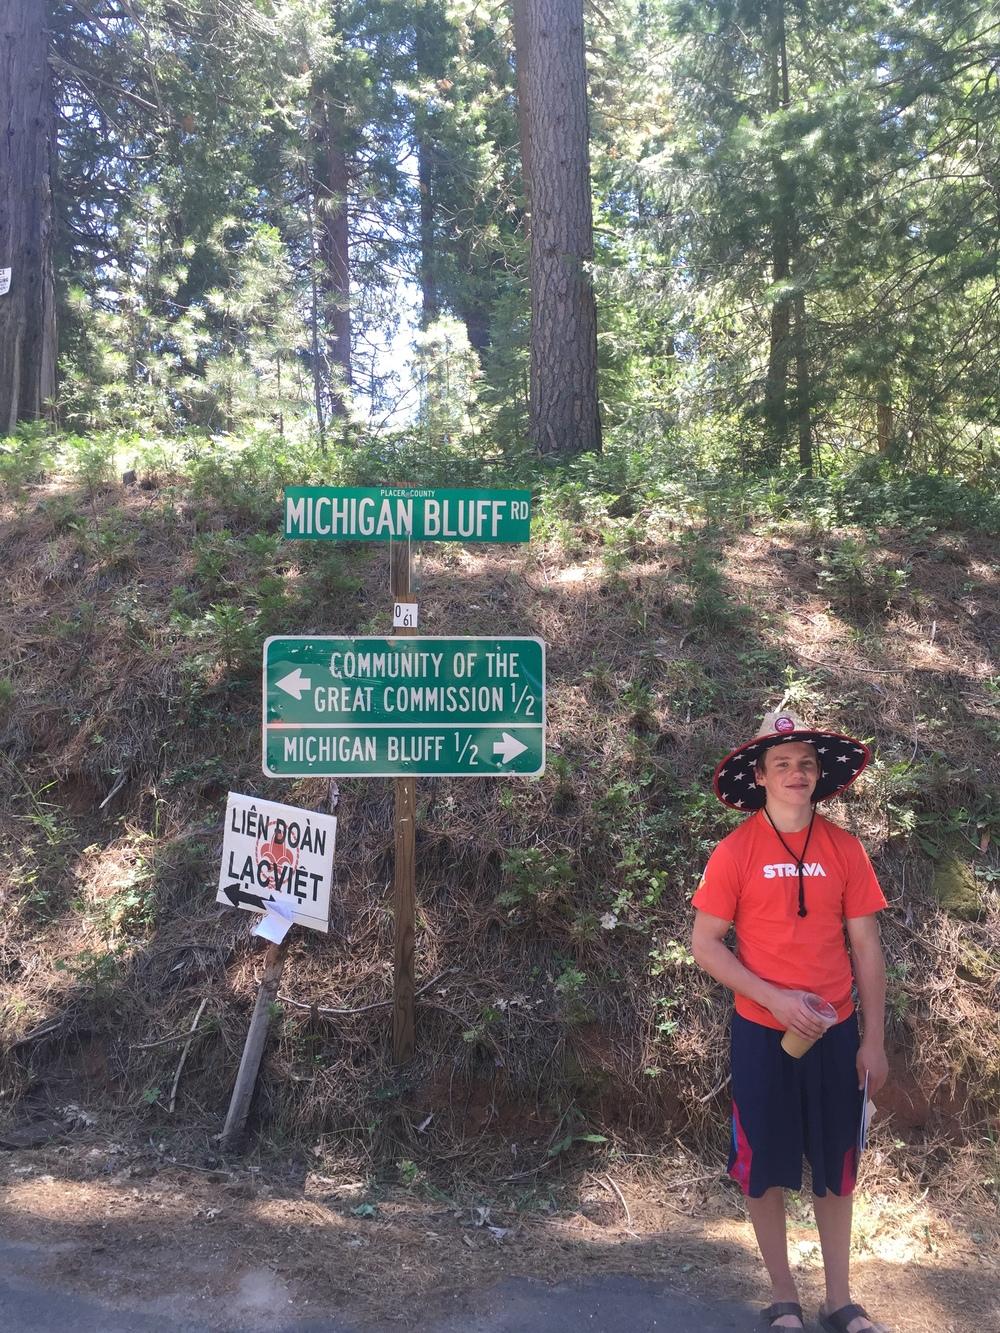 Albert waits at Michigan Bluff